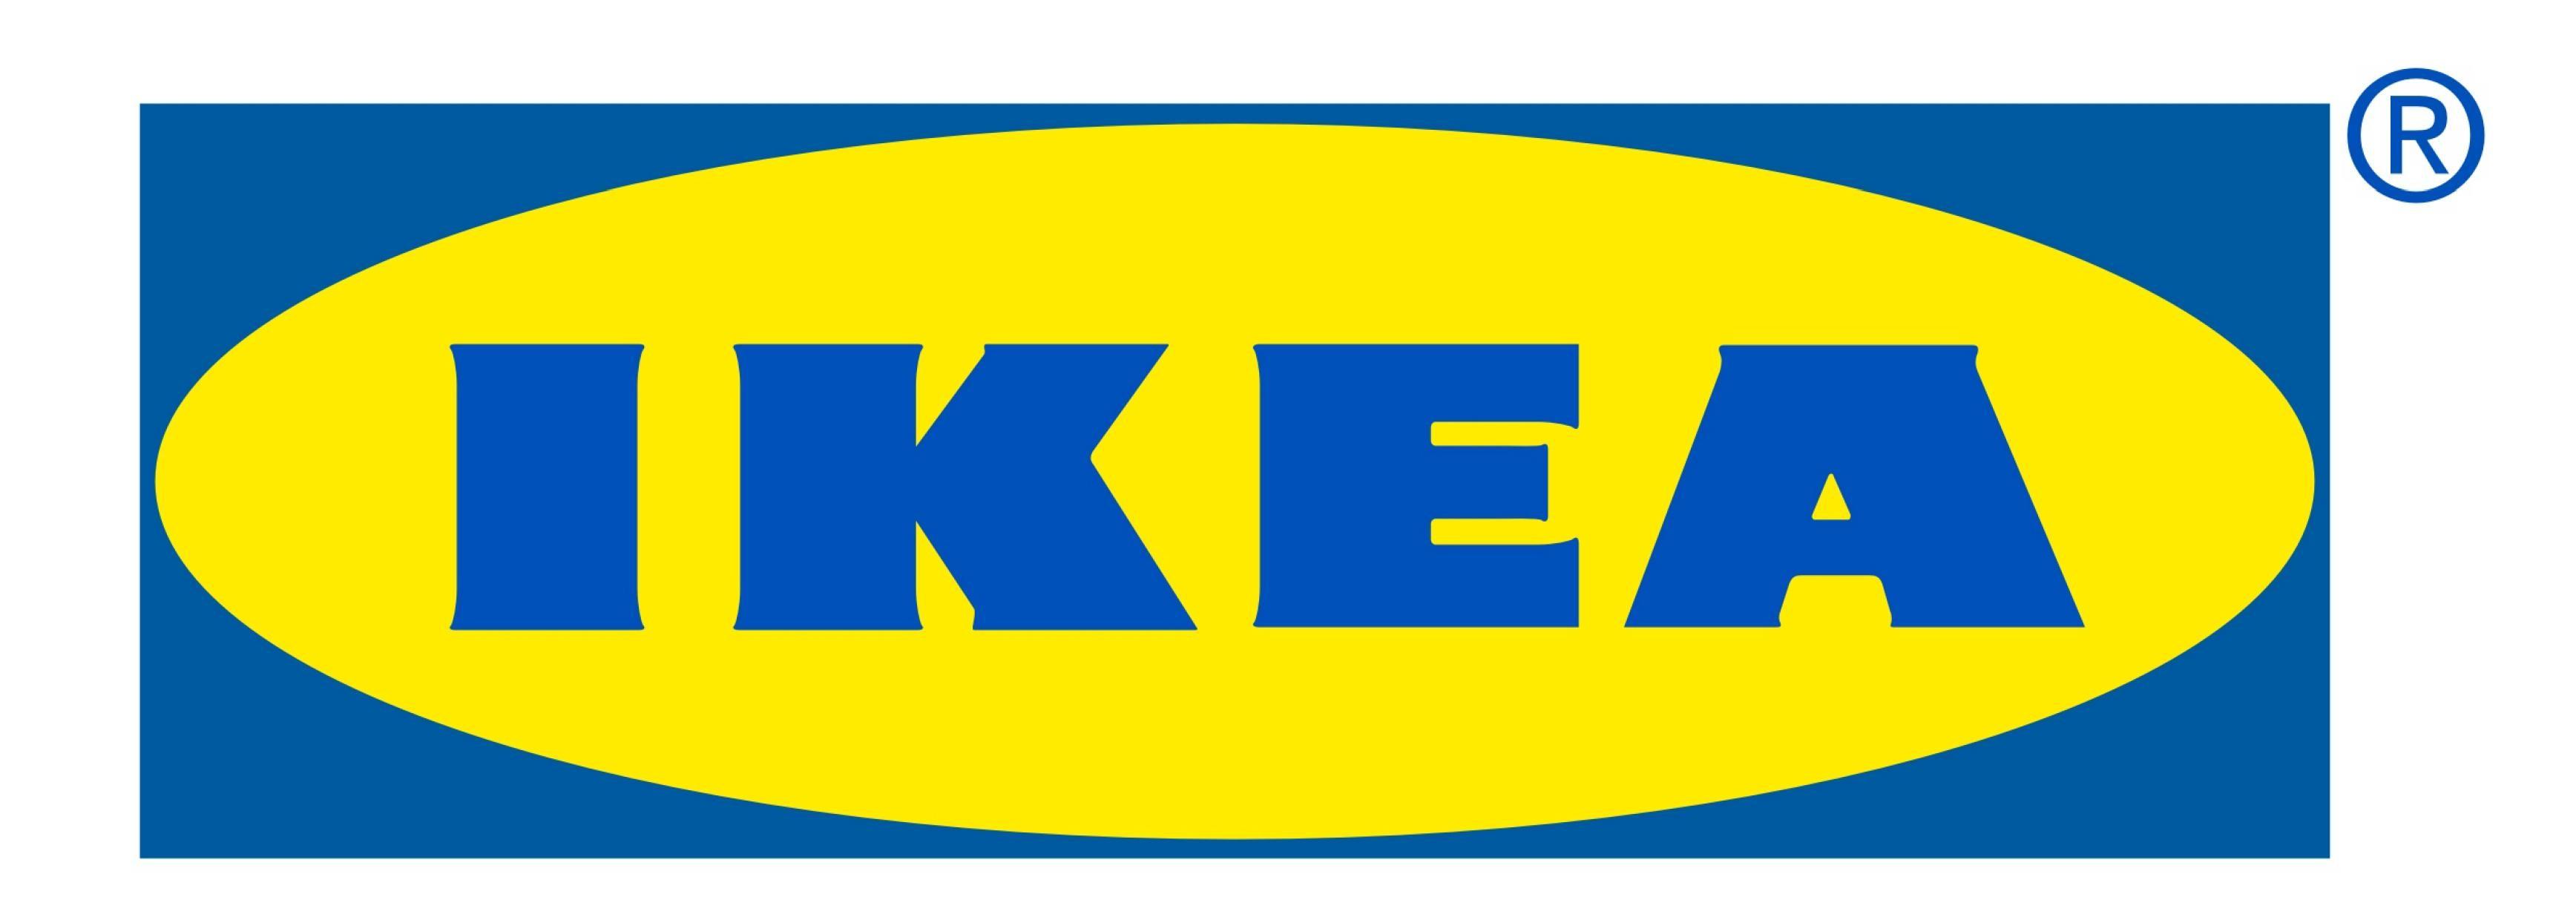 IKEA logo png download